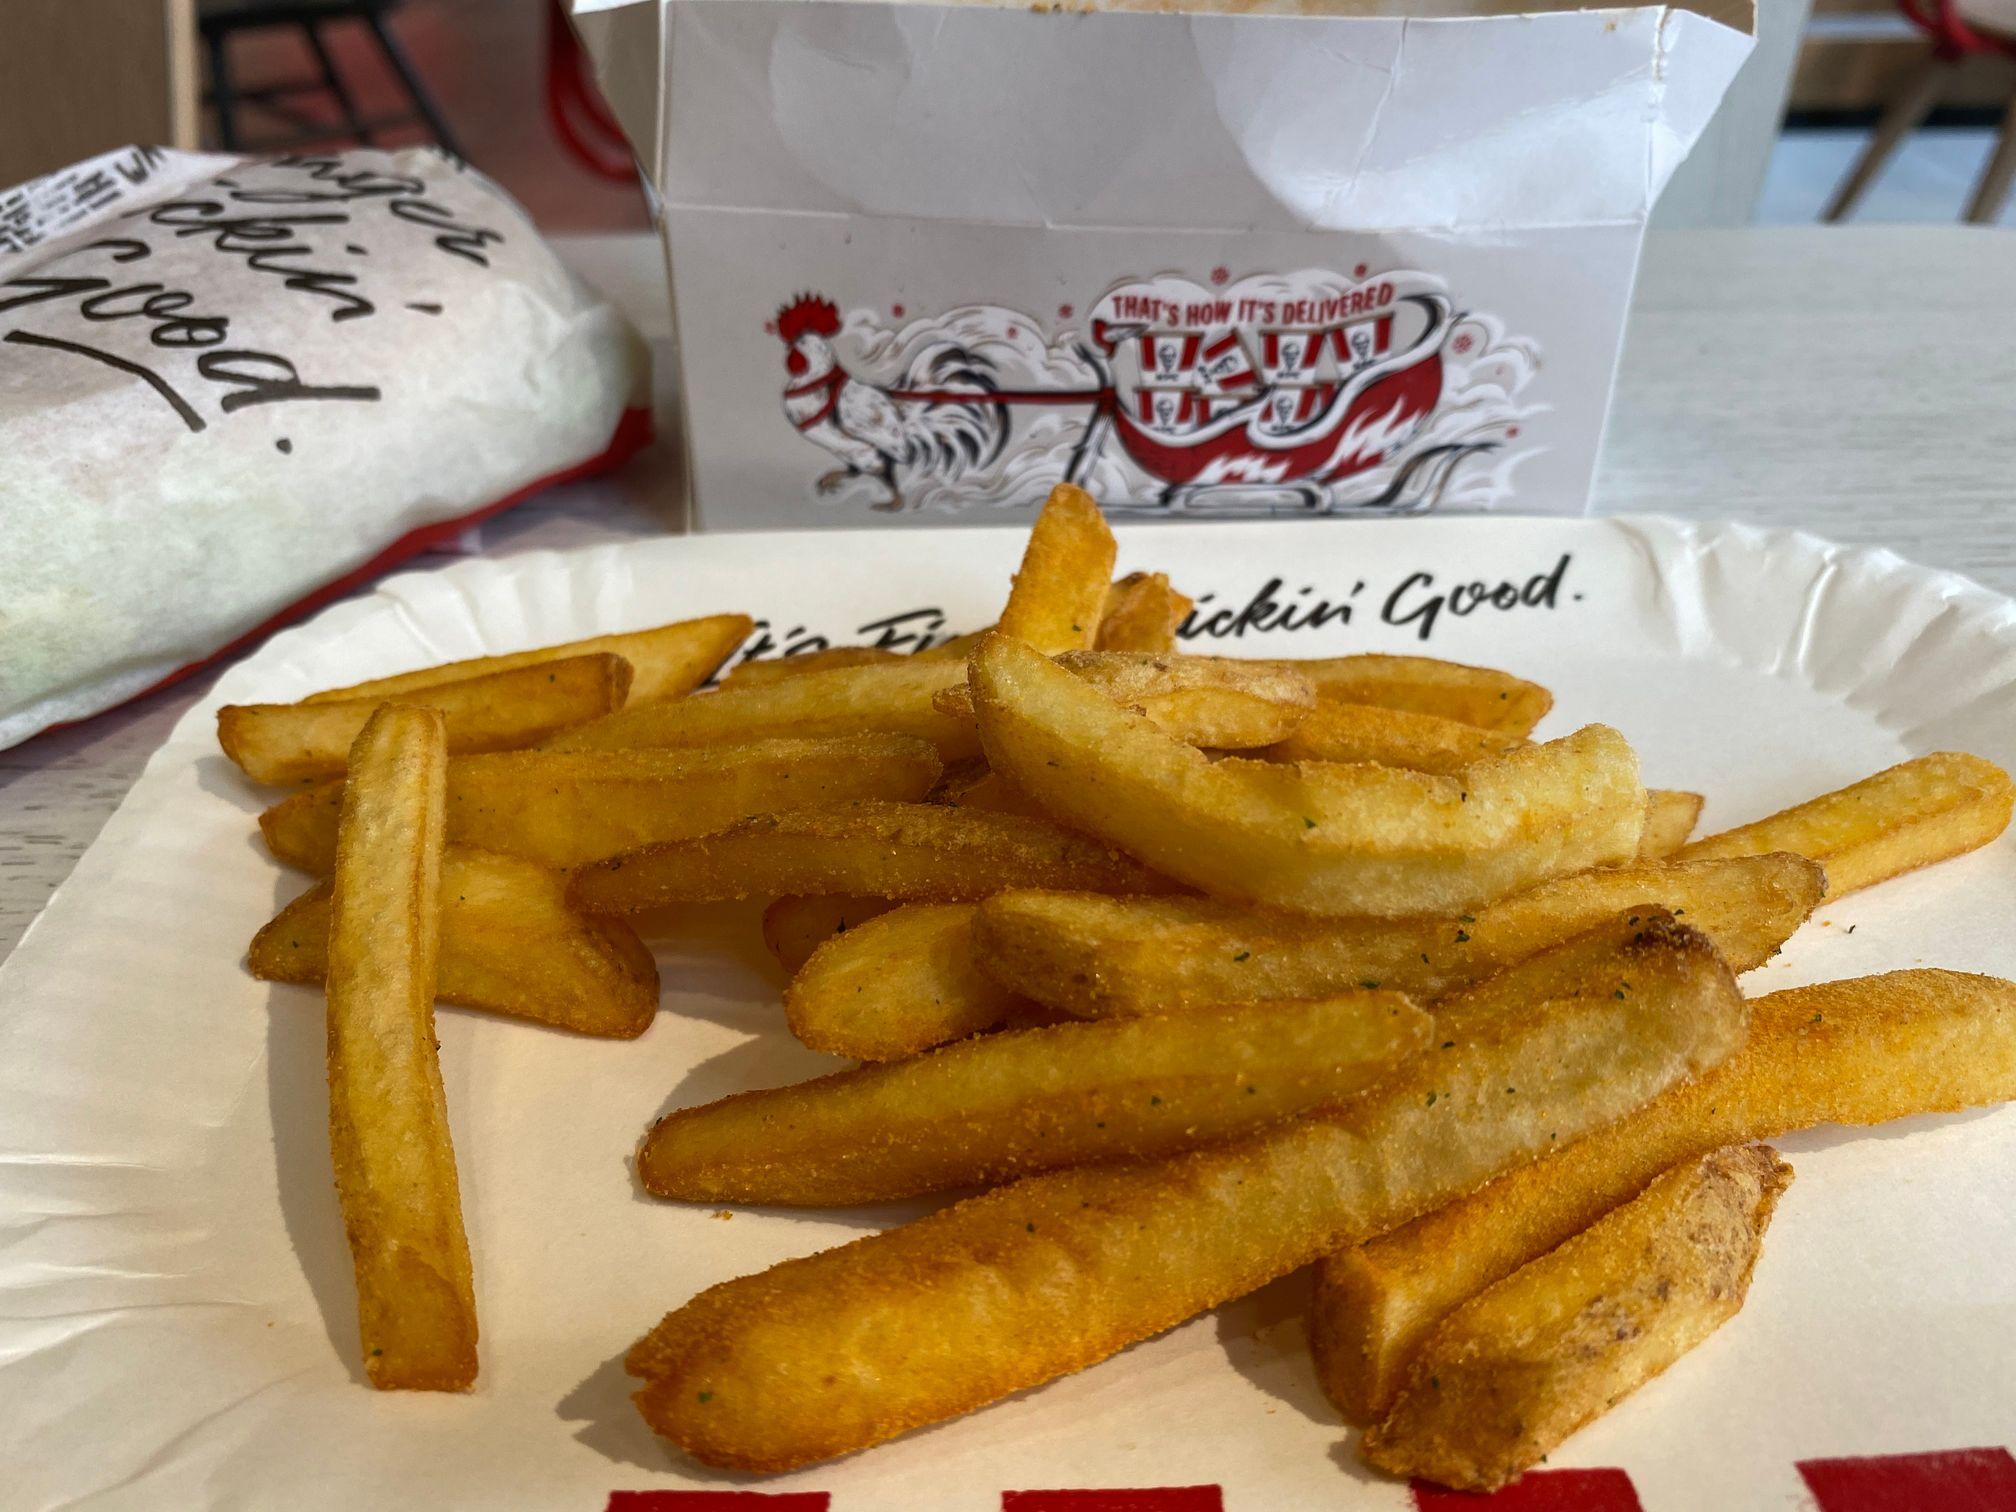 KFC Mini Fillet Burger